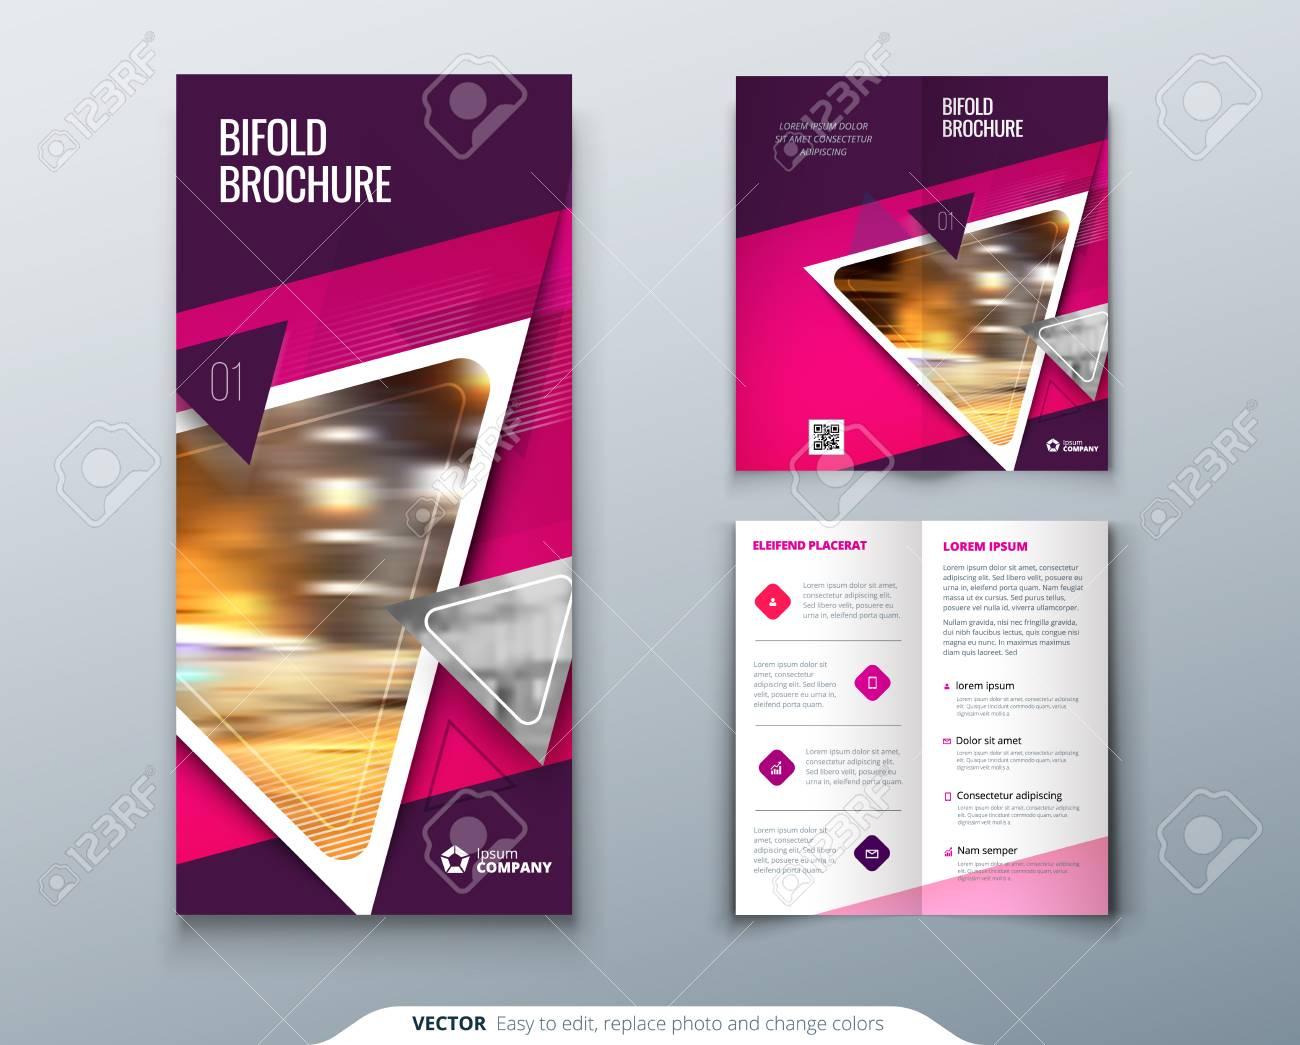 bi fold brochure design pink purple template for bi fold flyer